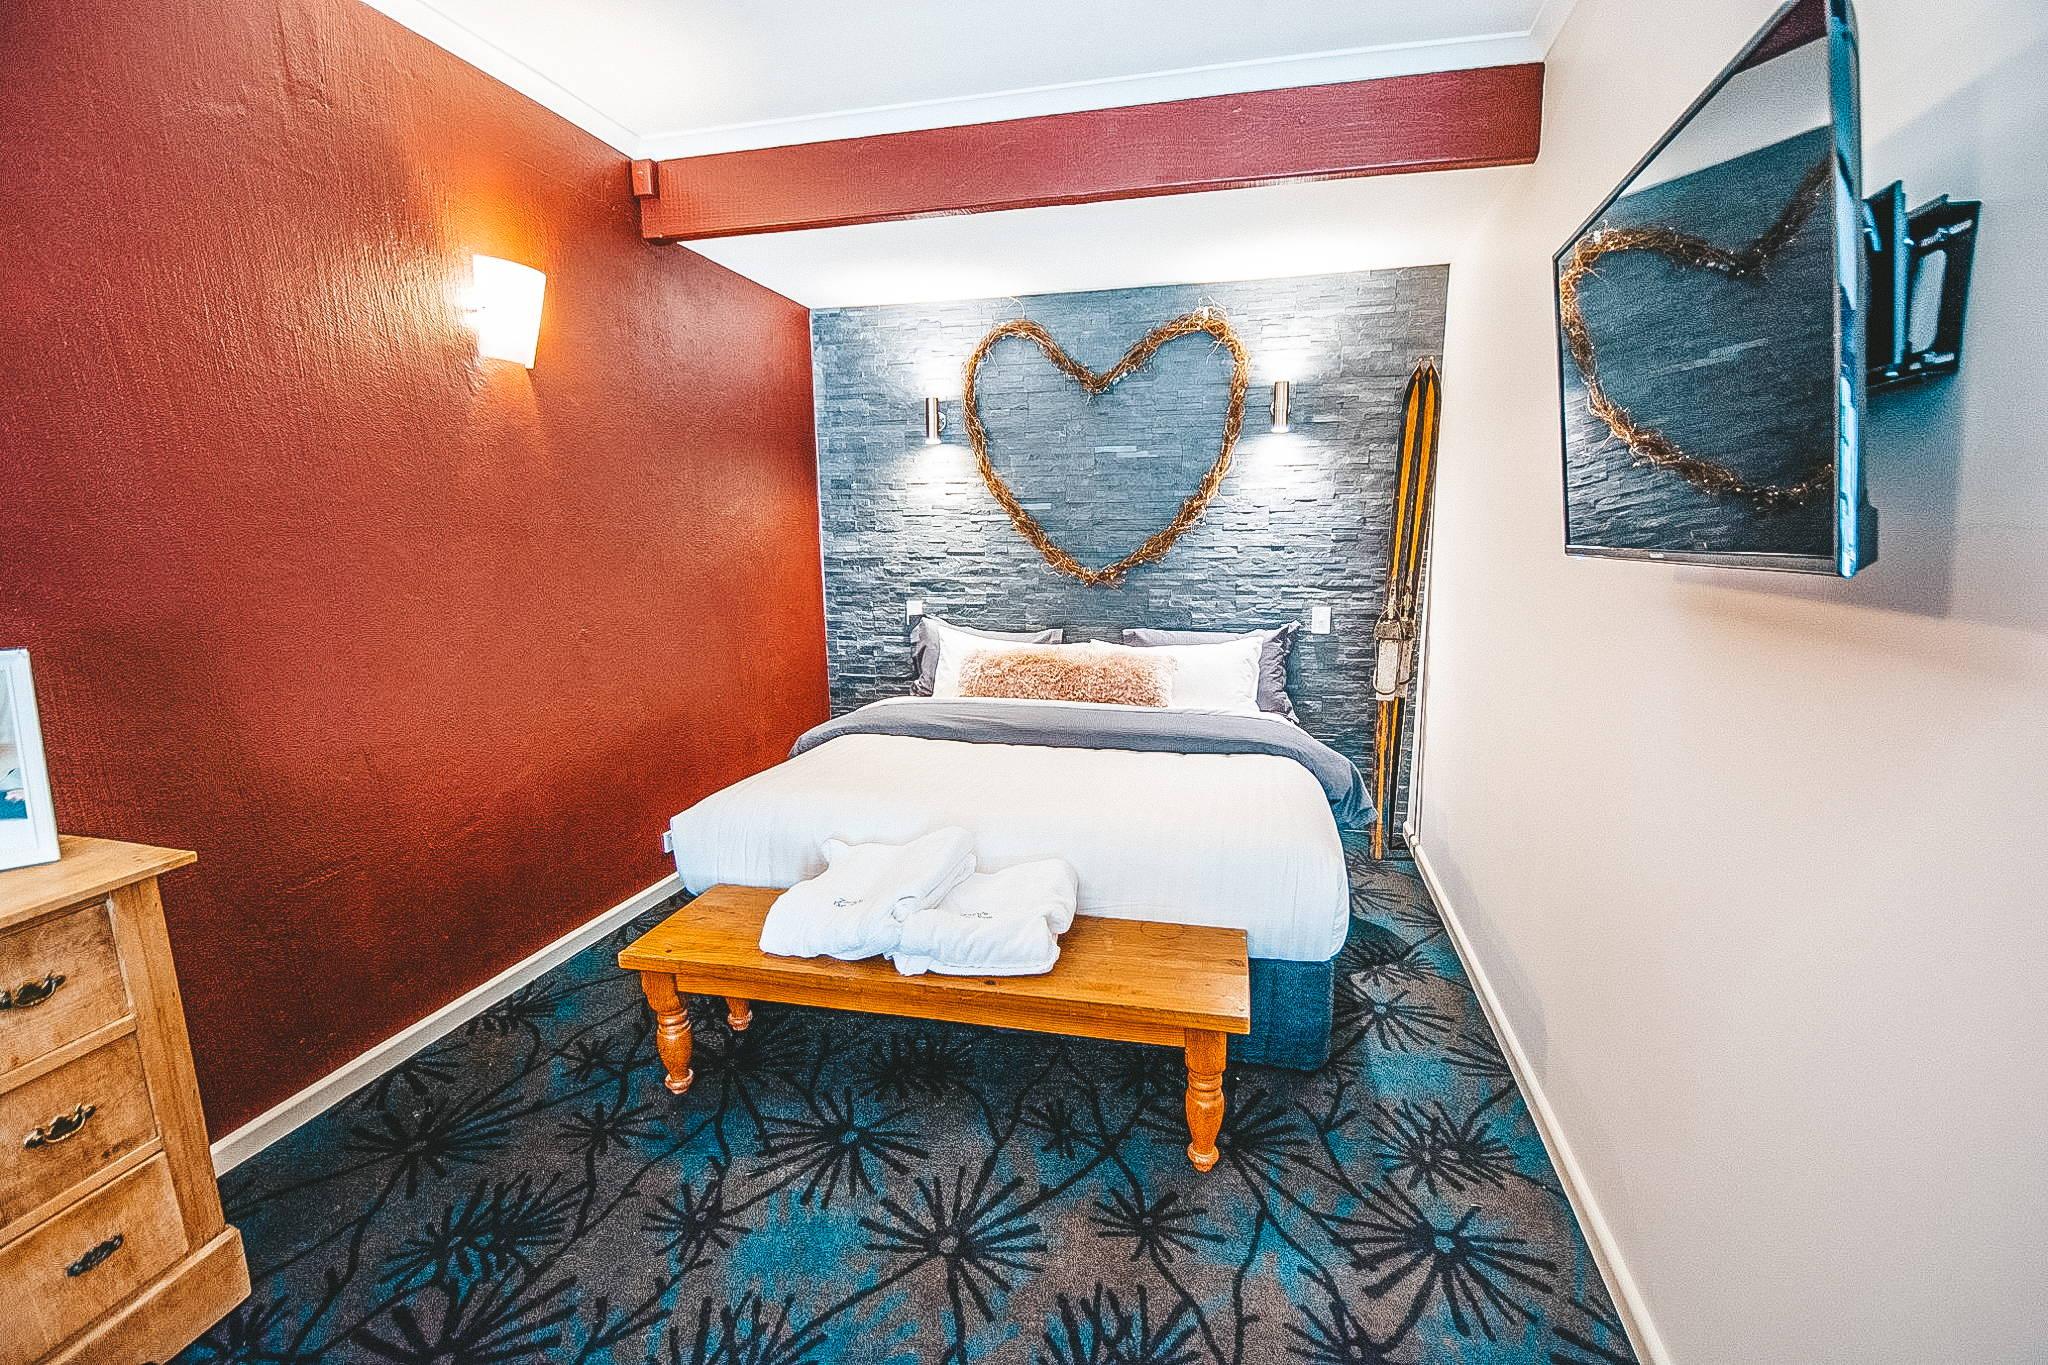 Honey-Moon Suite Image - Bernti's Thredbo Accommodation